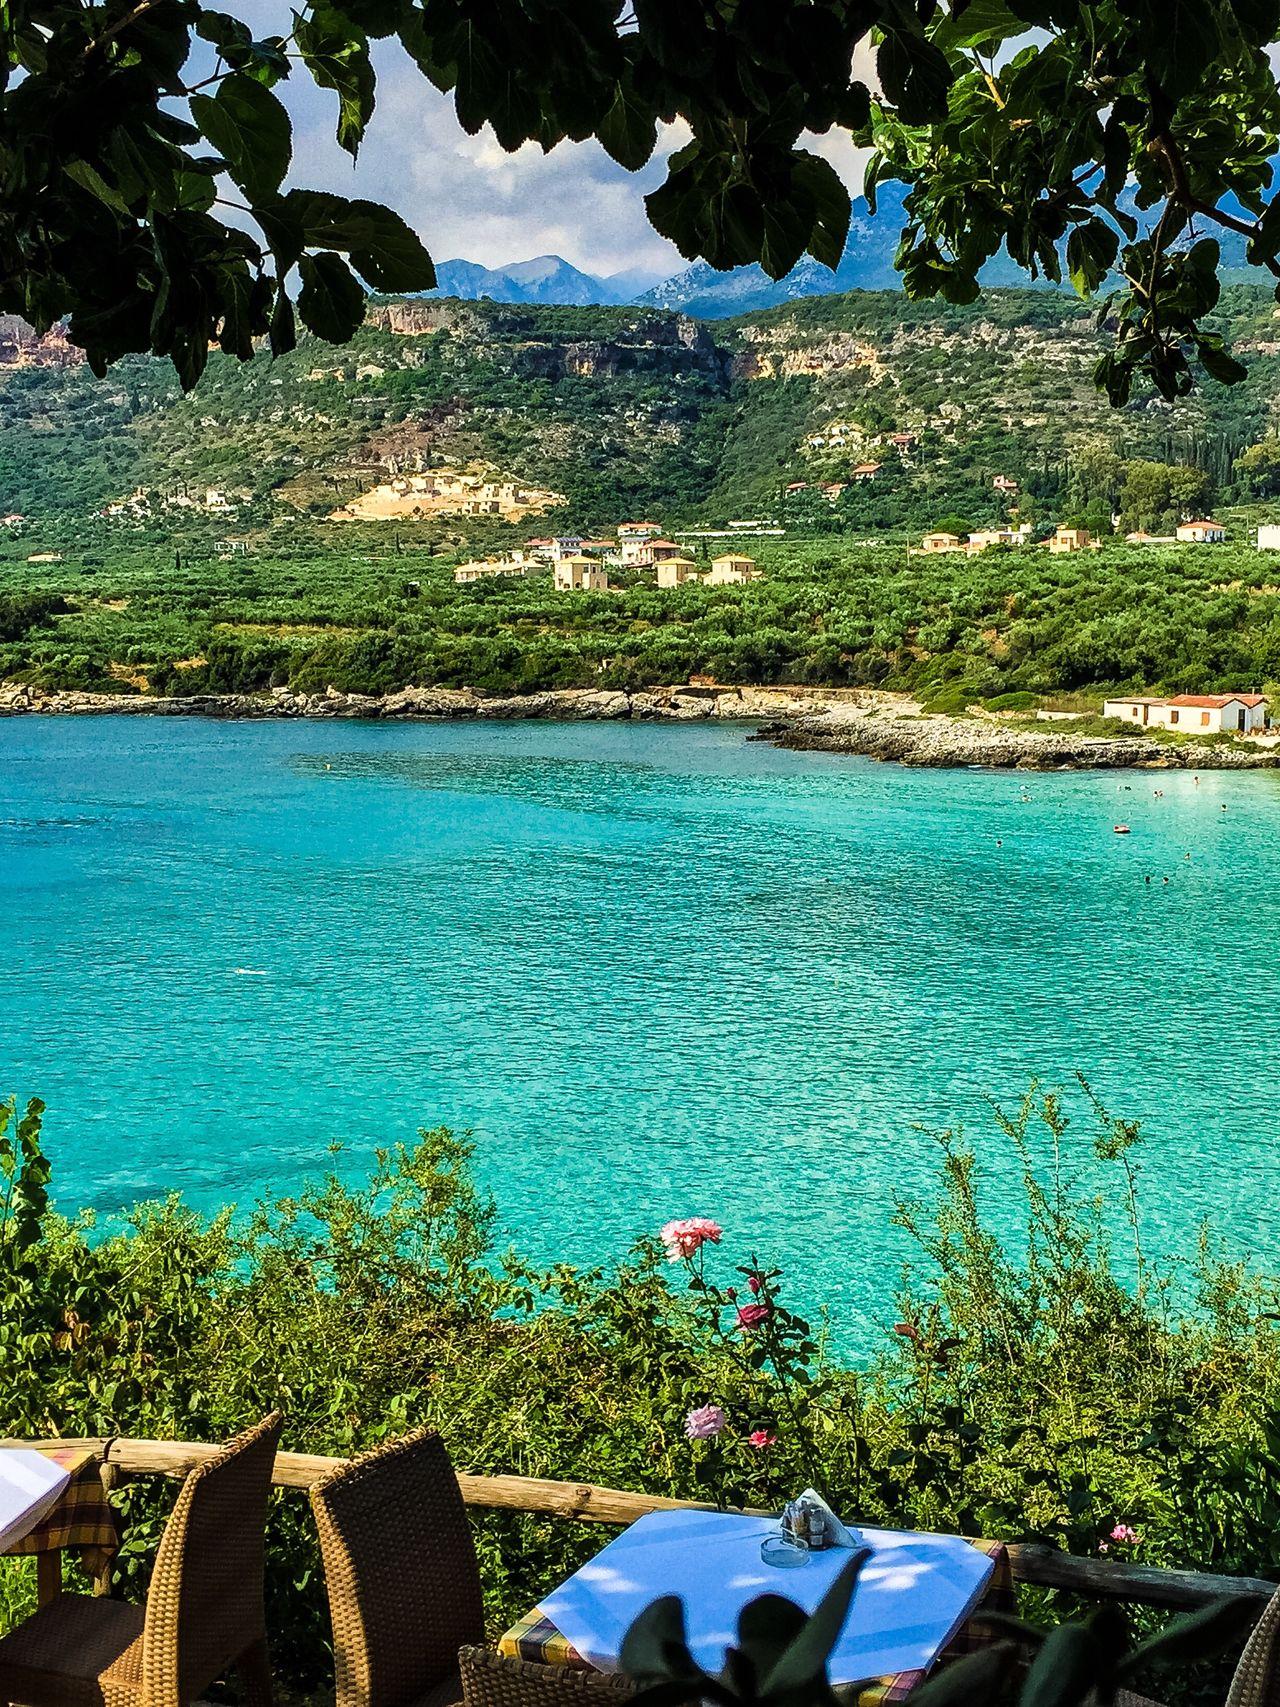 Greece GREECE ♥♥ Sea View Blue Blue Sky Summertime @photohackday @eyeem Blue Sea Sky_collection @eye4photograpy @EyeEmNatureLover EyeEm Best Shots Water Sun Kalamata